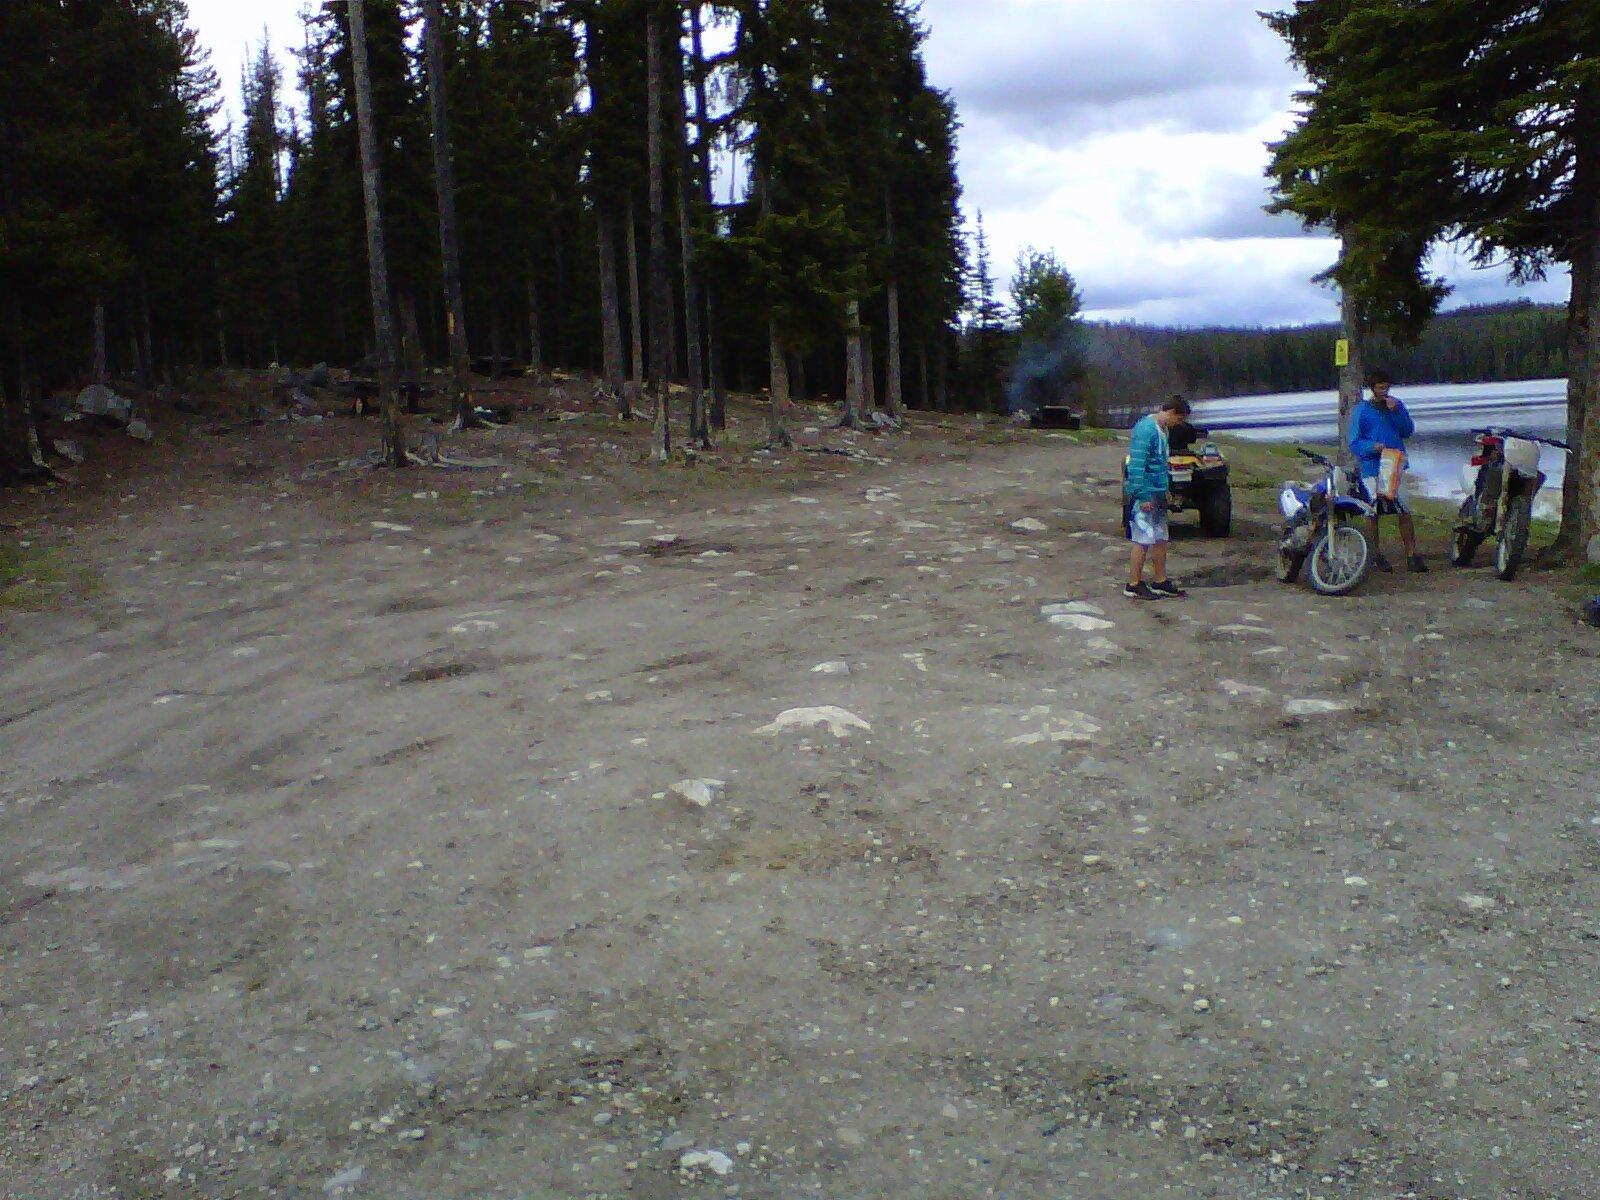 James lake free camping near kelowna bc for Lake james fishing